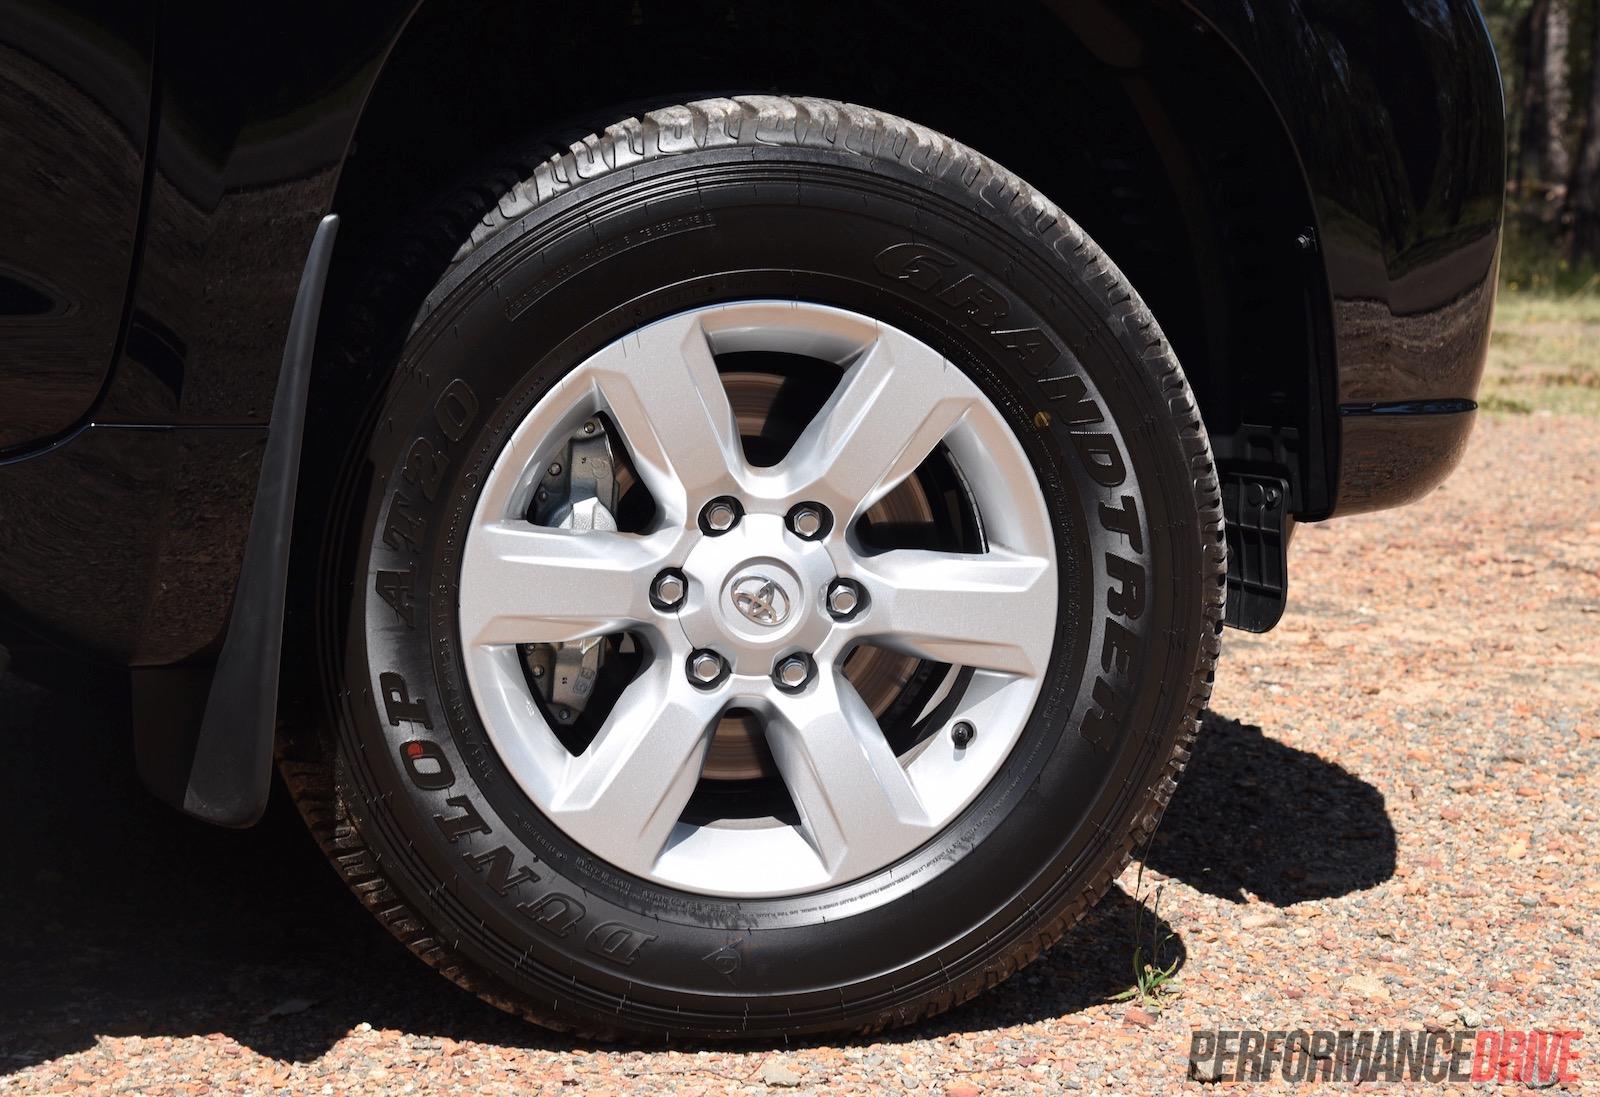 Toyota Landcruiser Prado Gxl In Wheels on Toyota Land Cruiser Prado Diesel